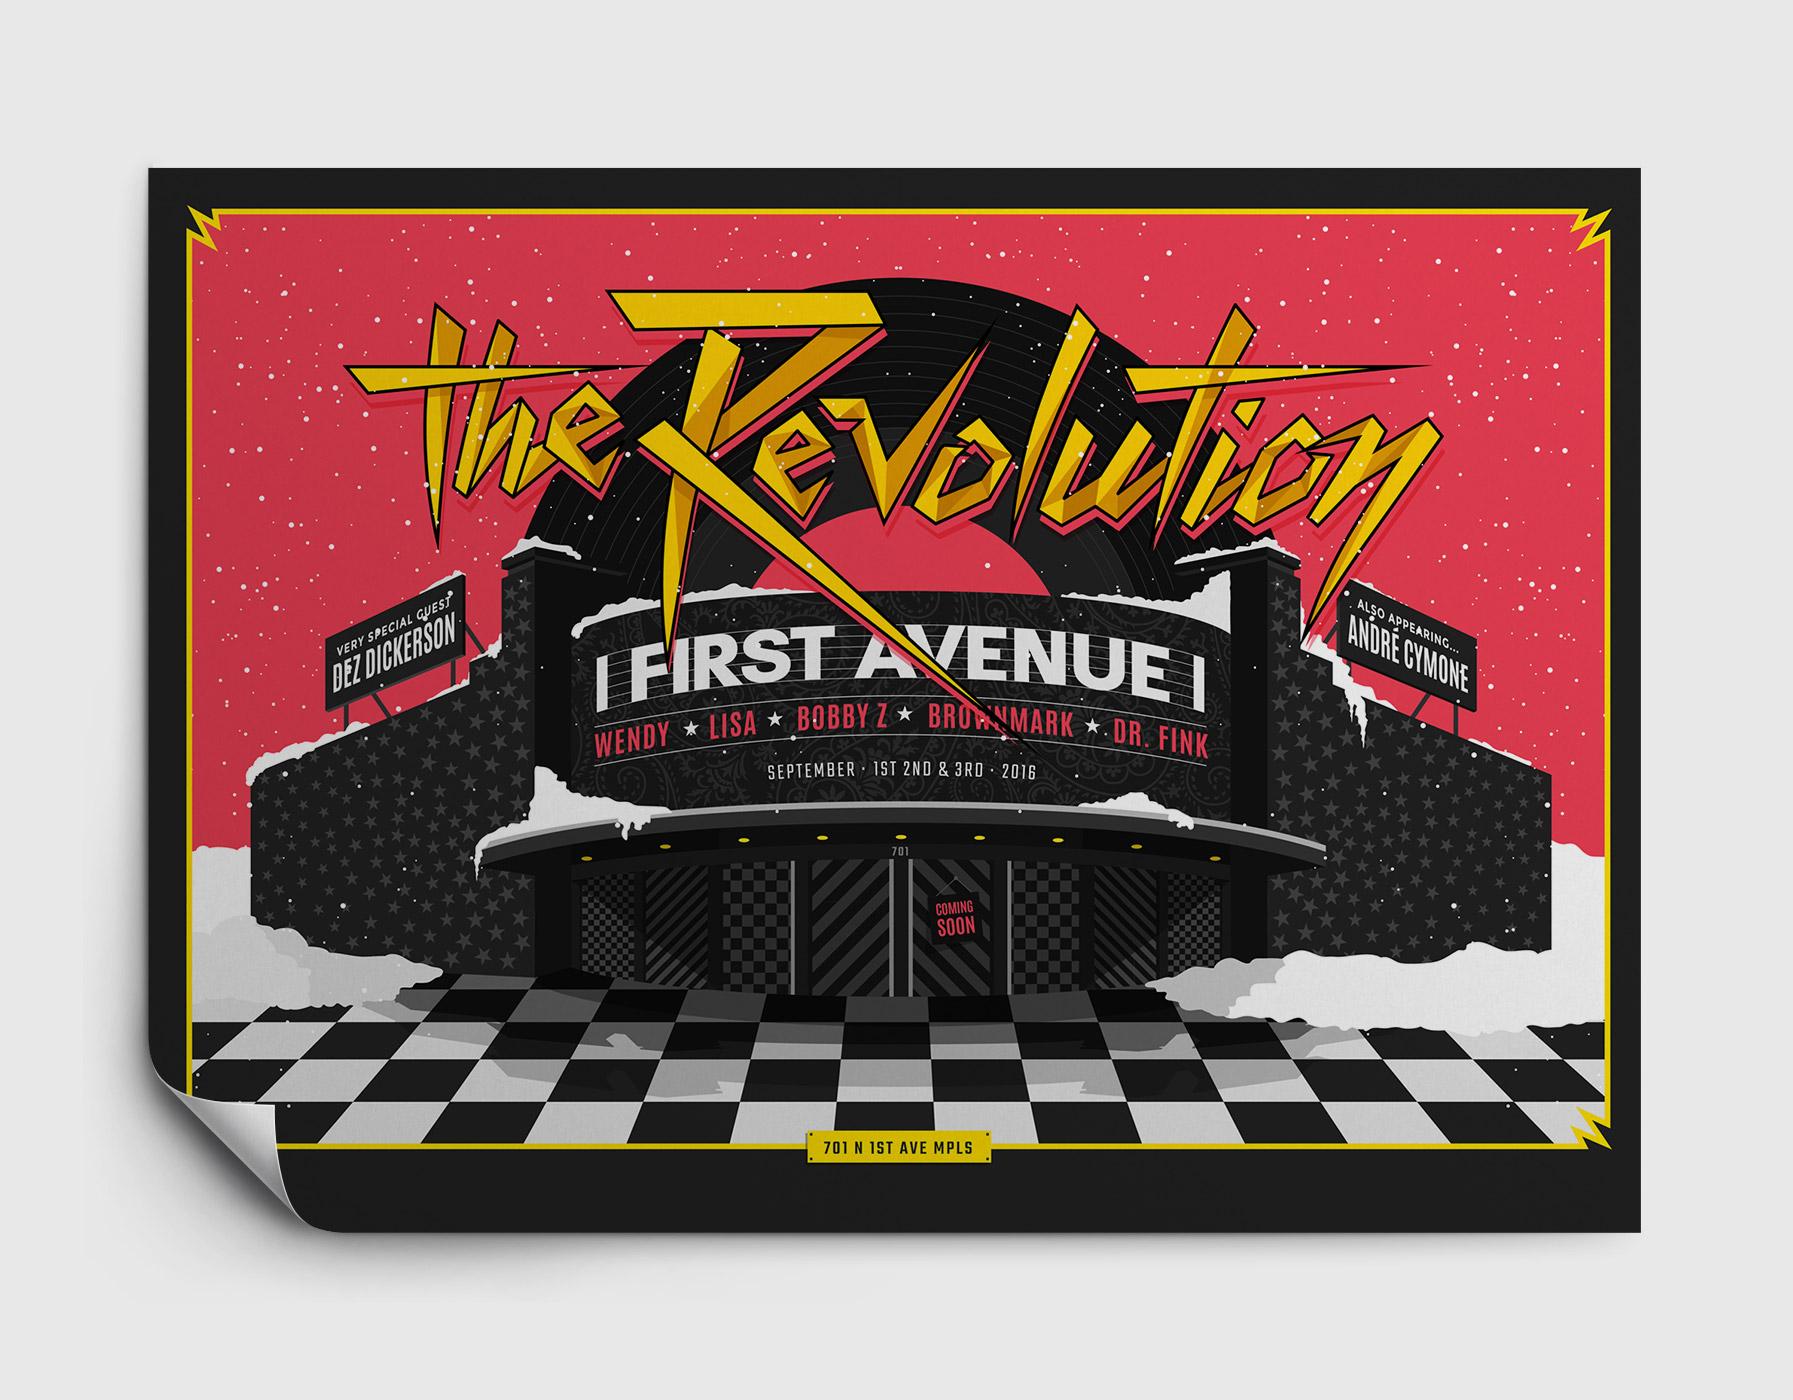 The Revolution poster design on hanging poster paper / Design by Heidi Skinner